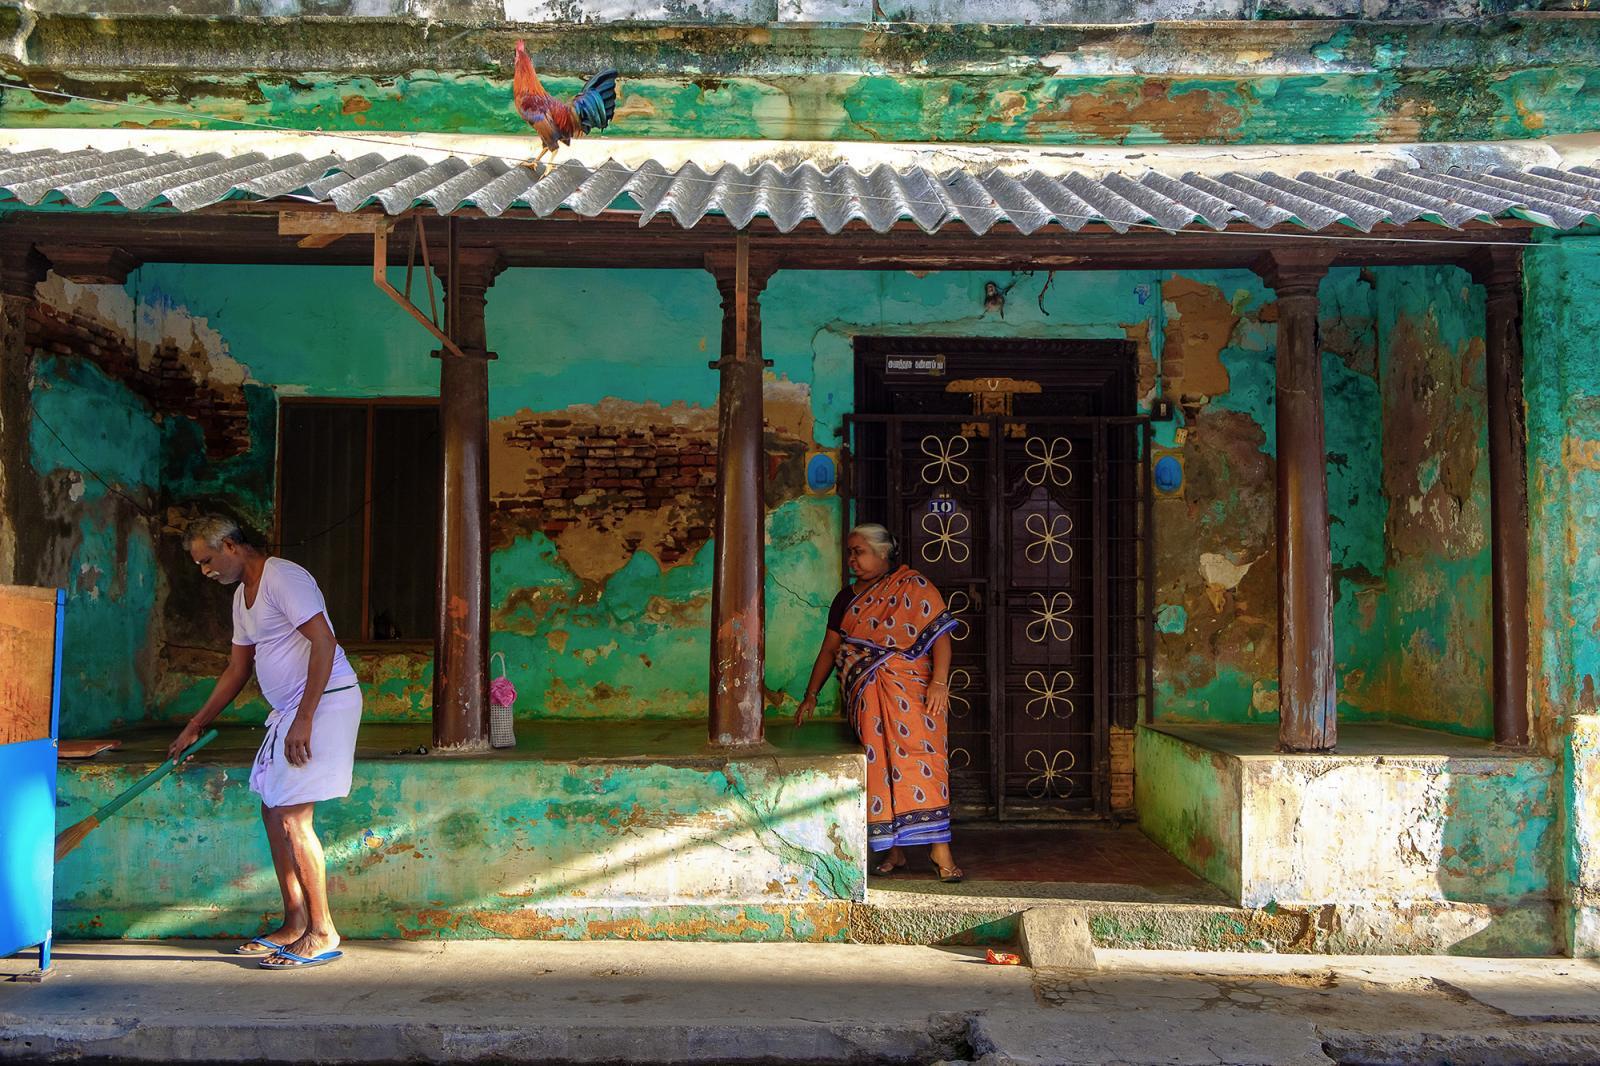 Photography image - Loading Tamil_Architecural_works__Thinnai_pondicherry__culture_tamil__Tamilnadu__Tamils_home._Vintage_design___mouhamed_moustapha__colours__thinnai13.jpg